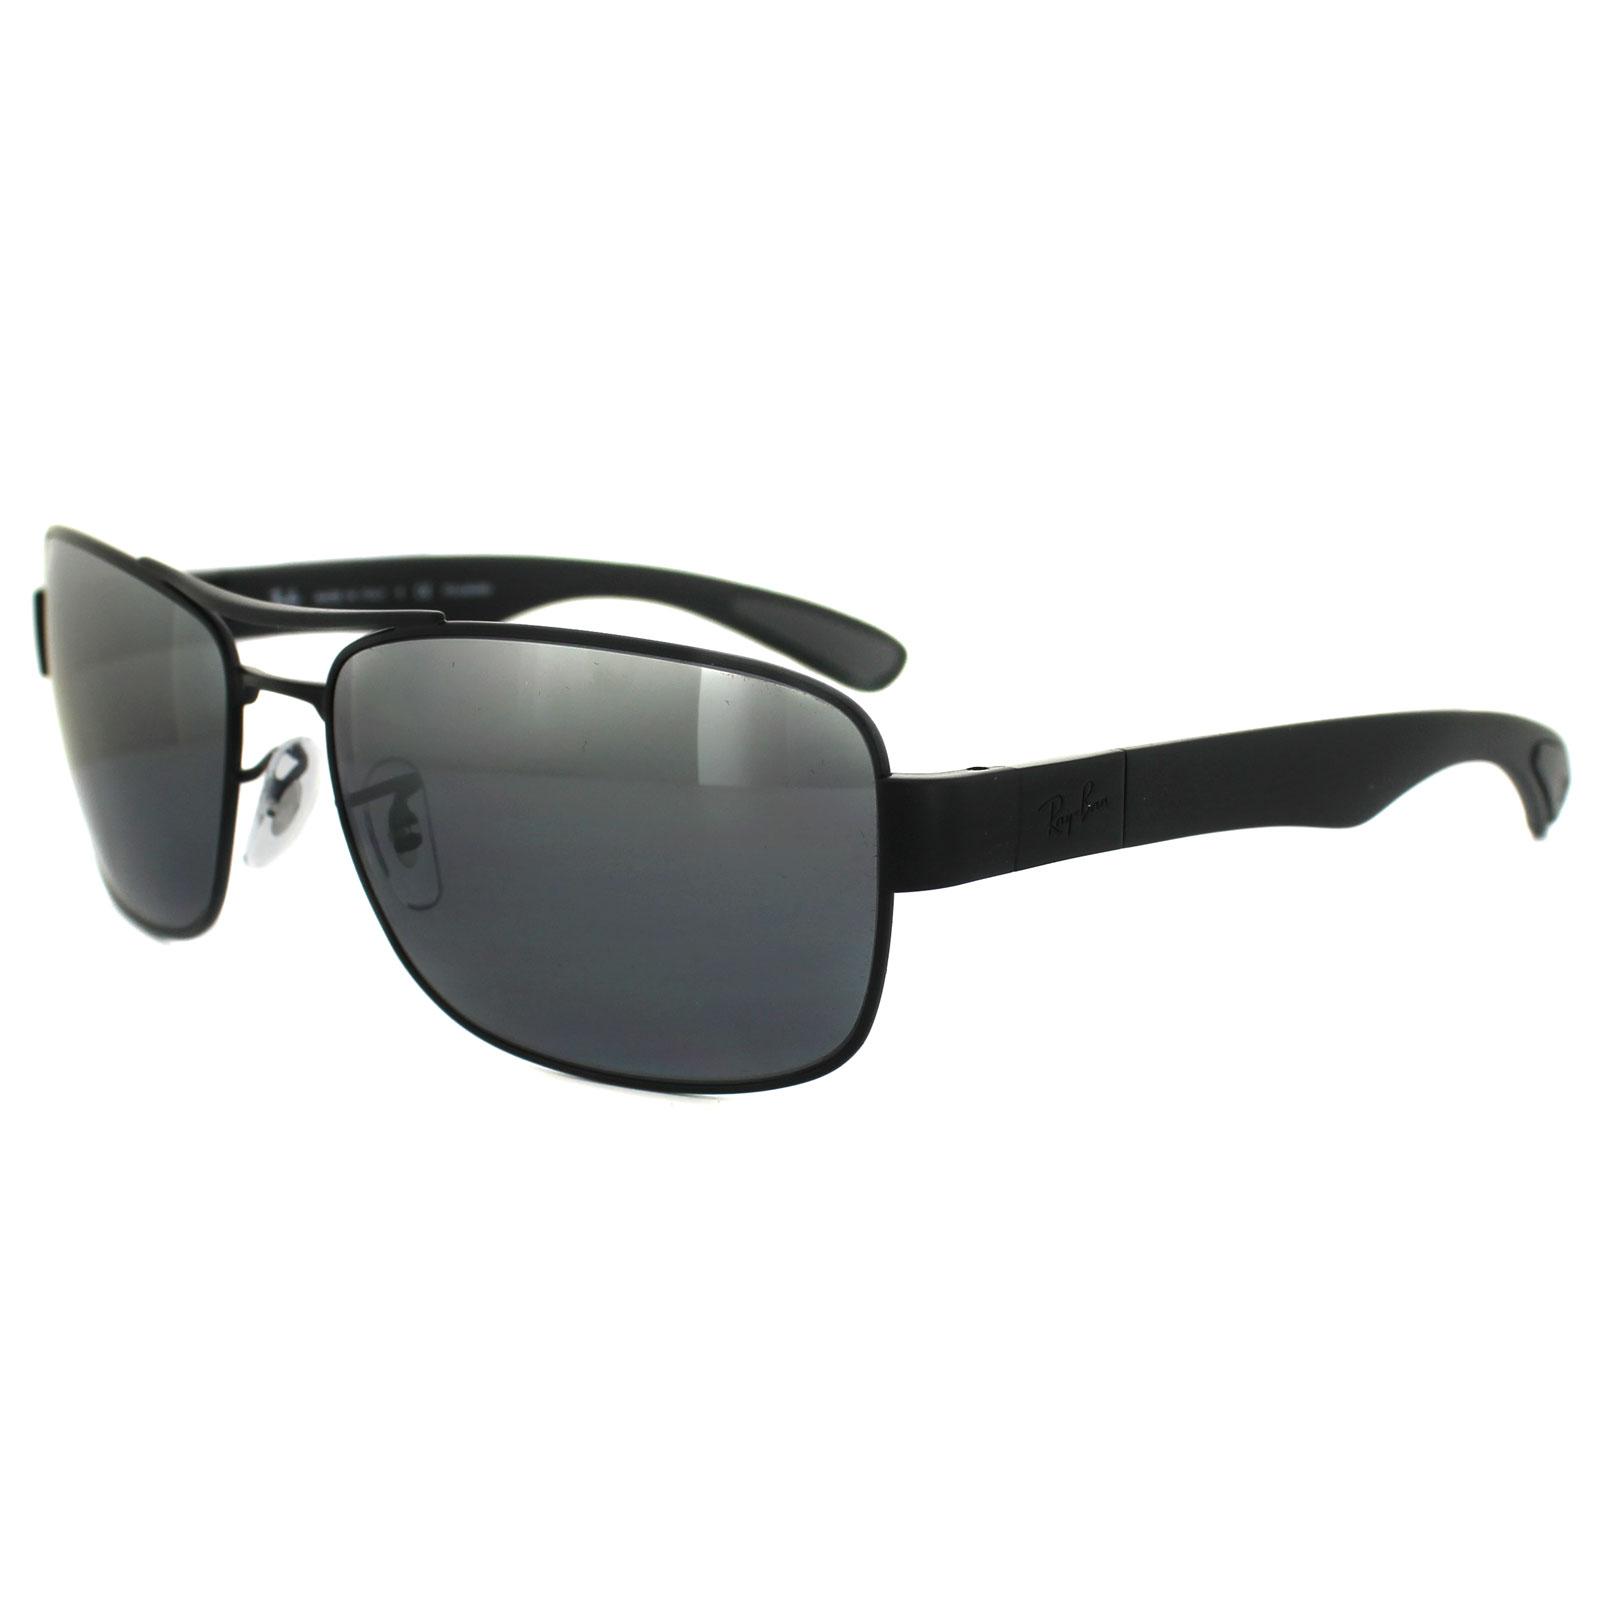 Ray-Ban Sunglasses 3522 006/82 Black Silver Mirror Polarized